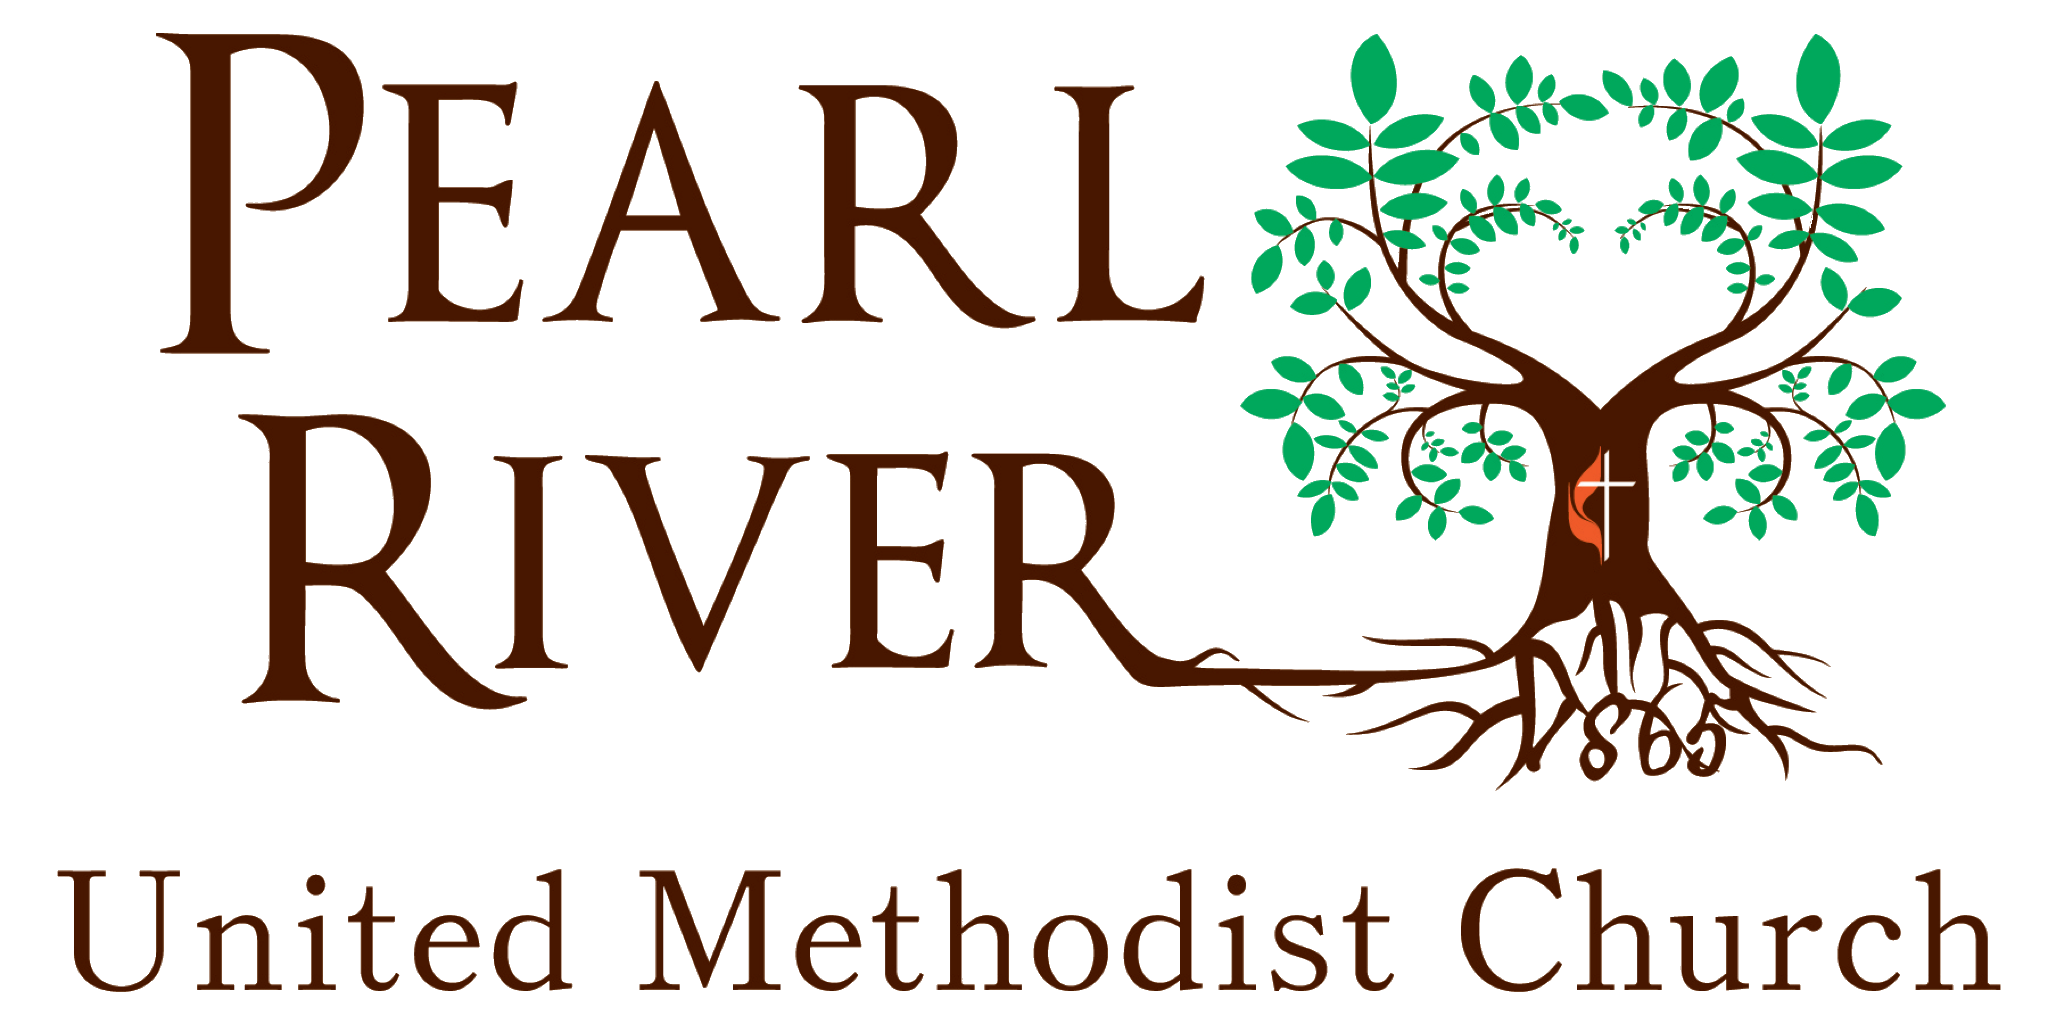 Pearl River United Methodist Church